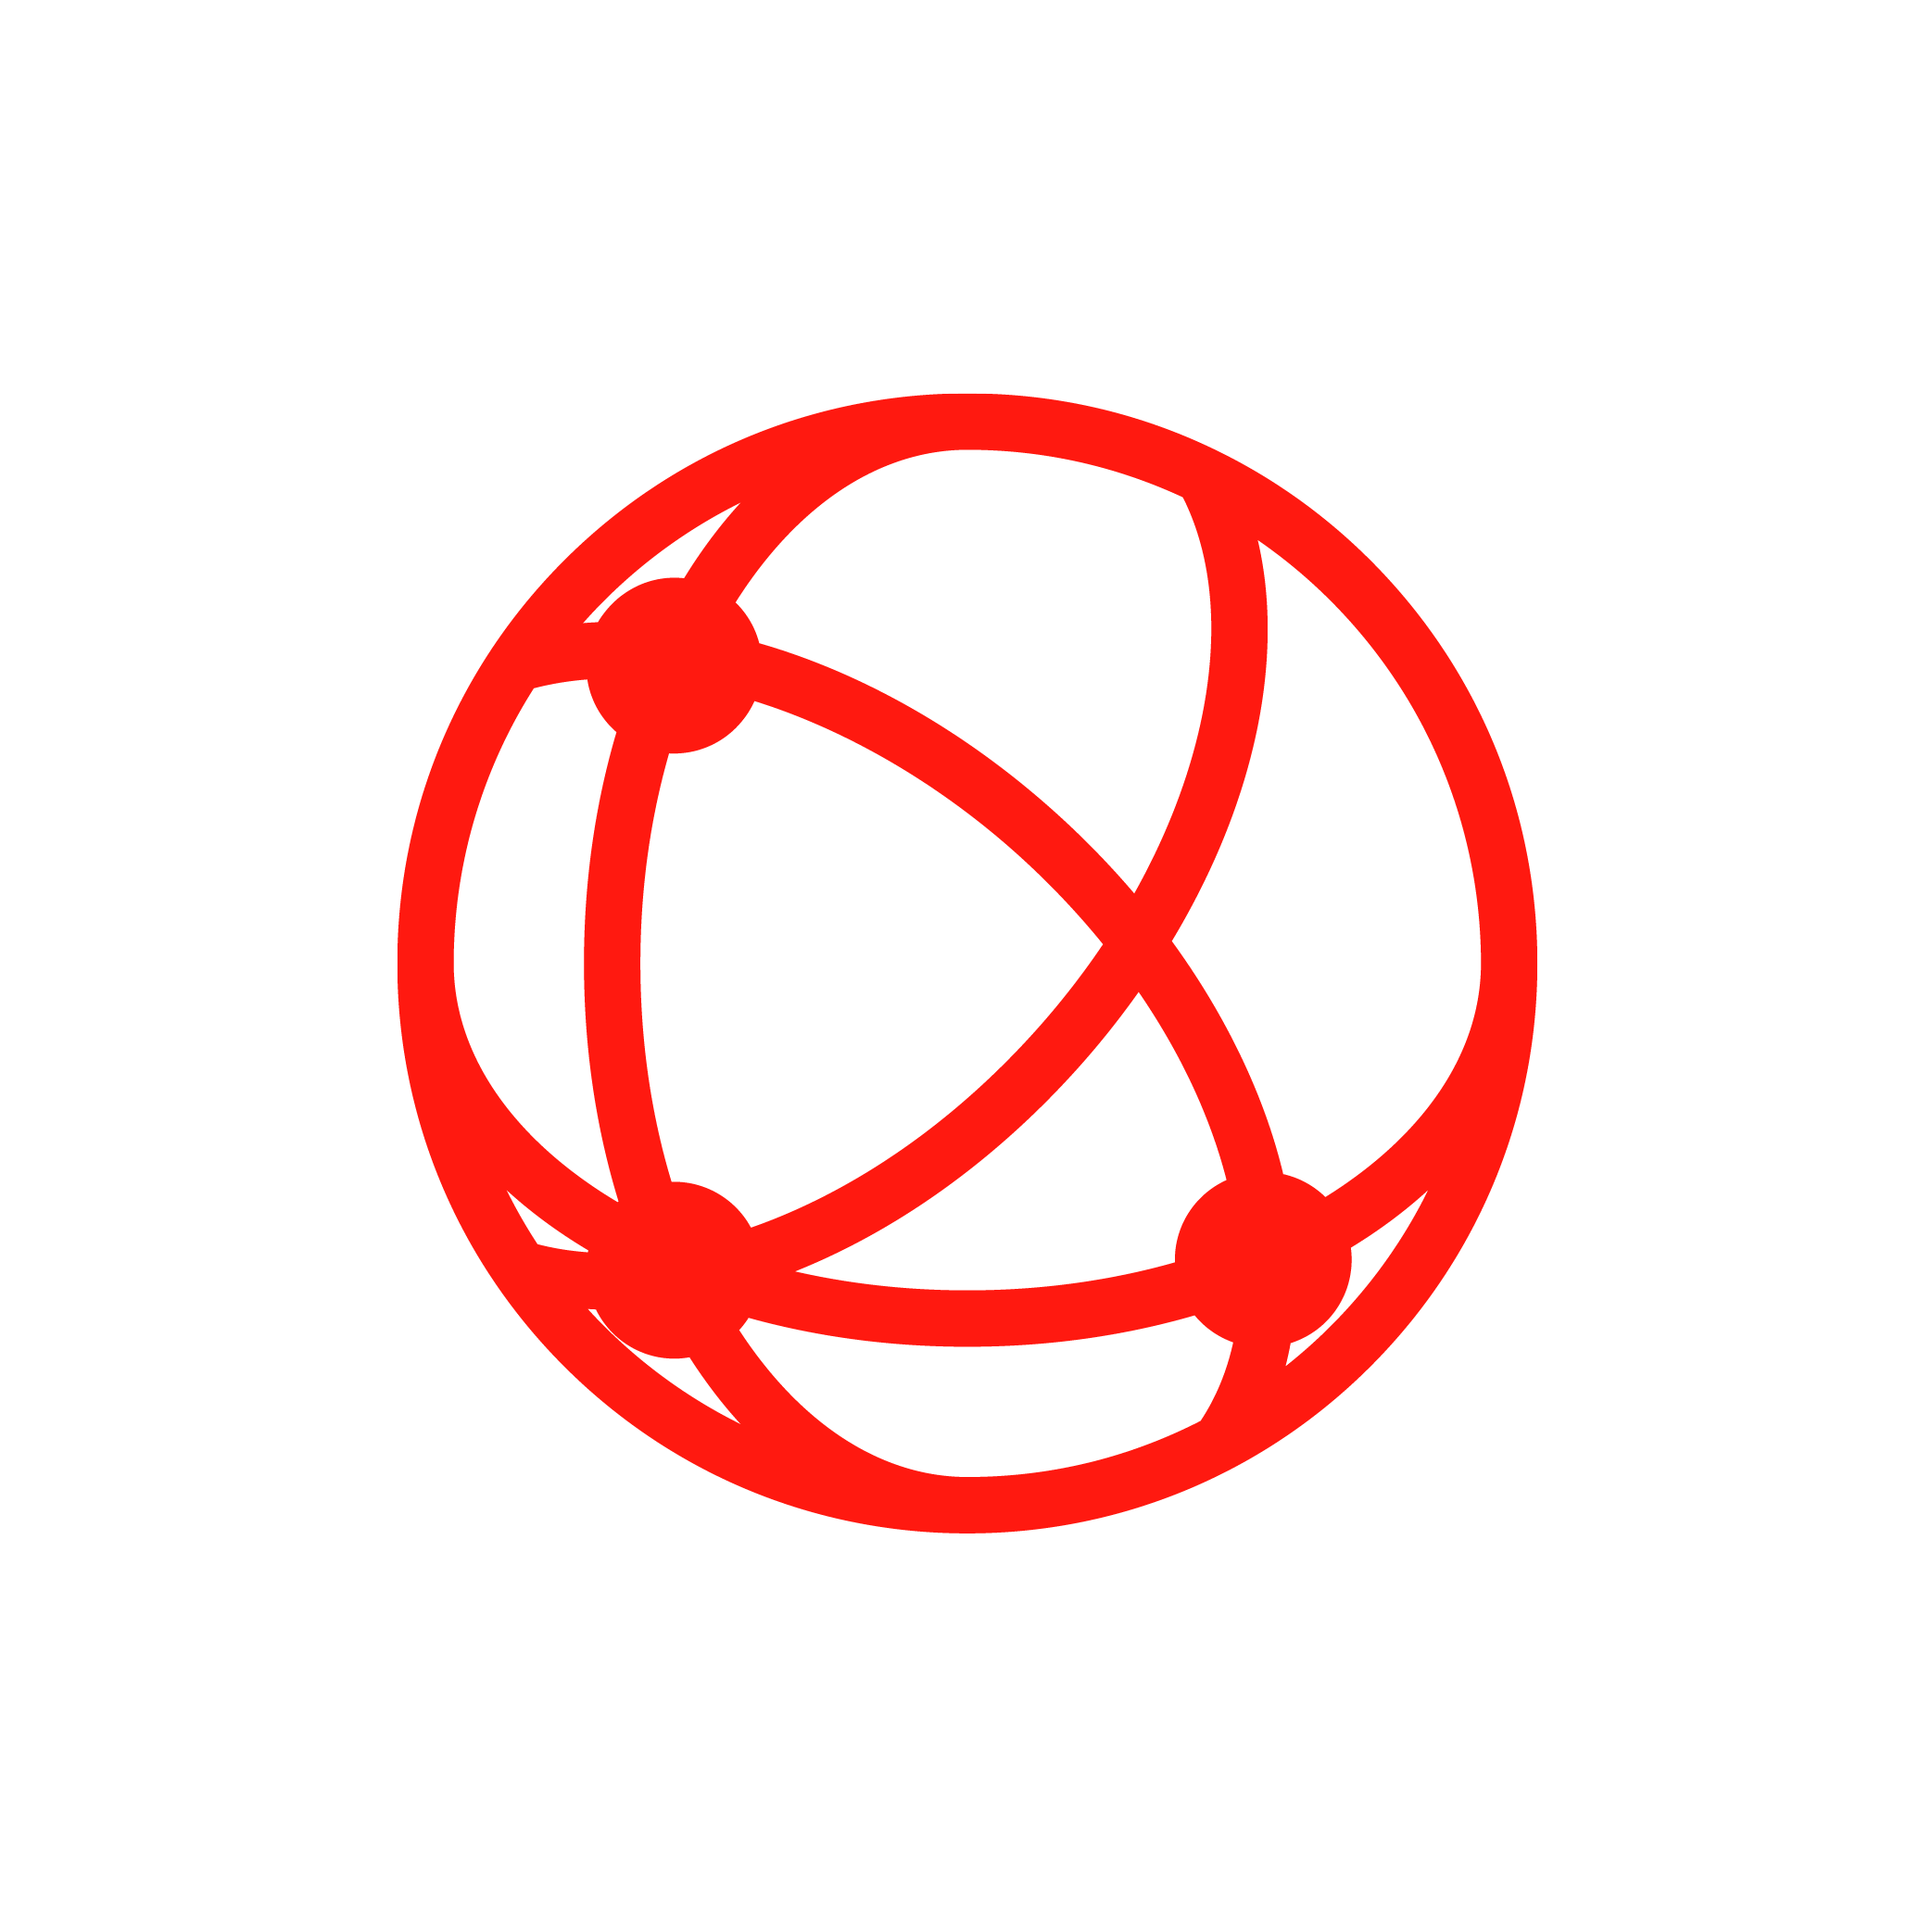 icon-network-management@2x